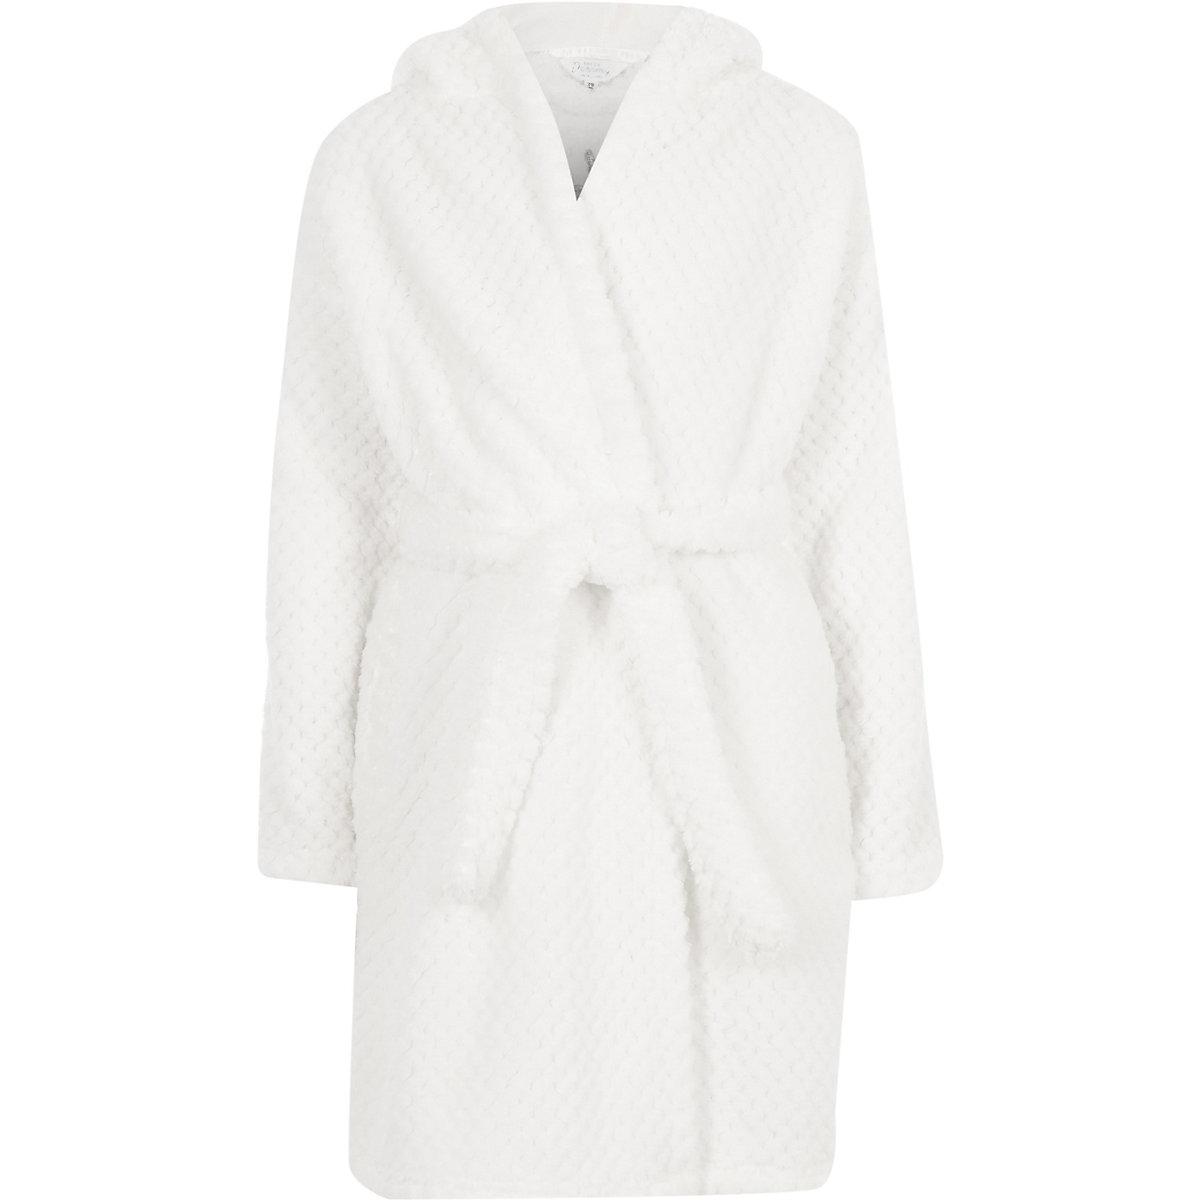 Robe De Chambre Motif Licorne Blanche Pour Fille Pyjamas Sous